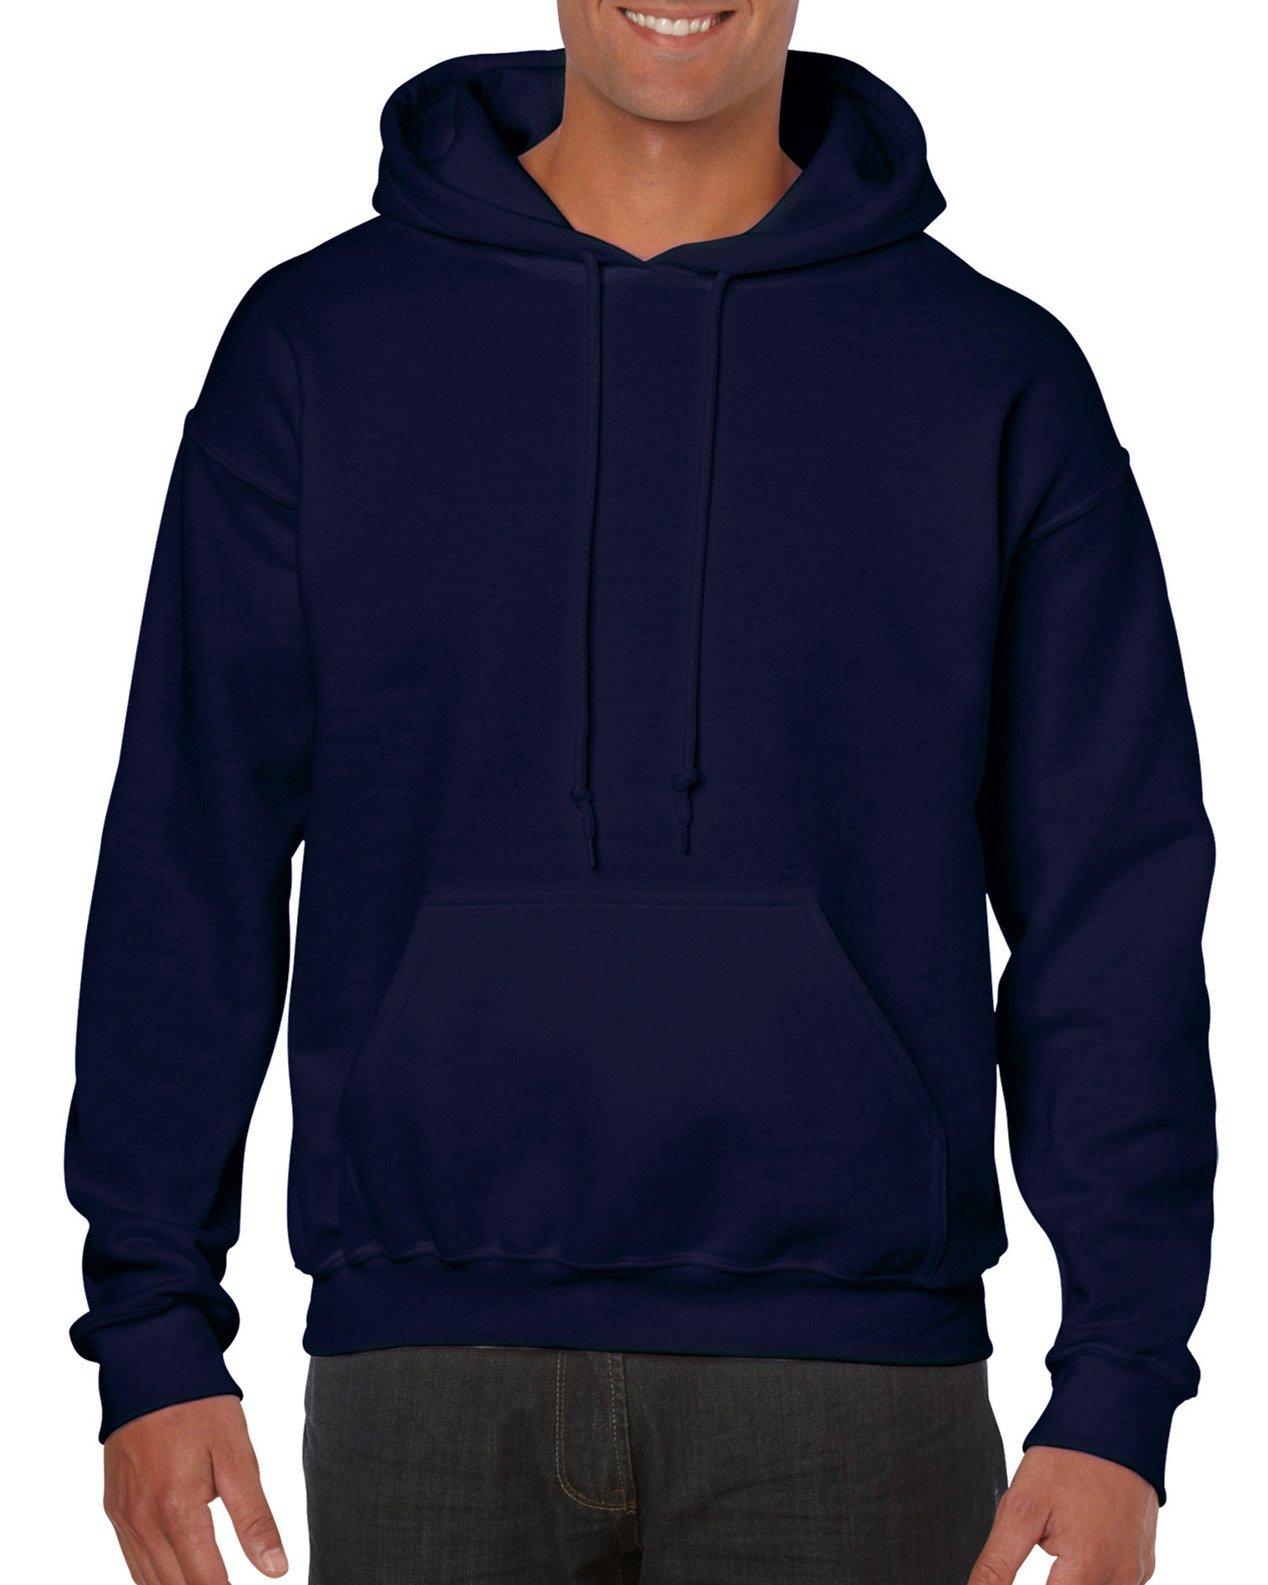 Gildan Men's Big and Tall Heavy Blend Fleece Hooded Sweatshirt G18500, Navy 3X-Large